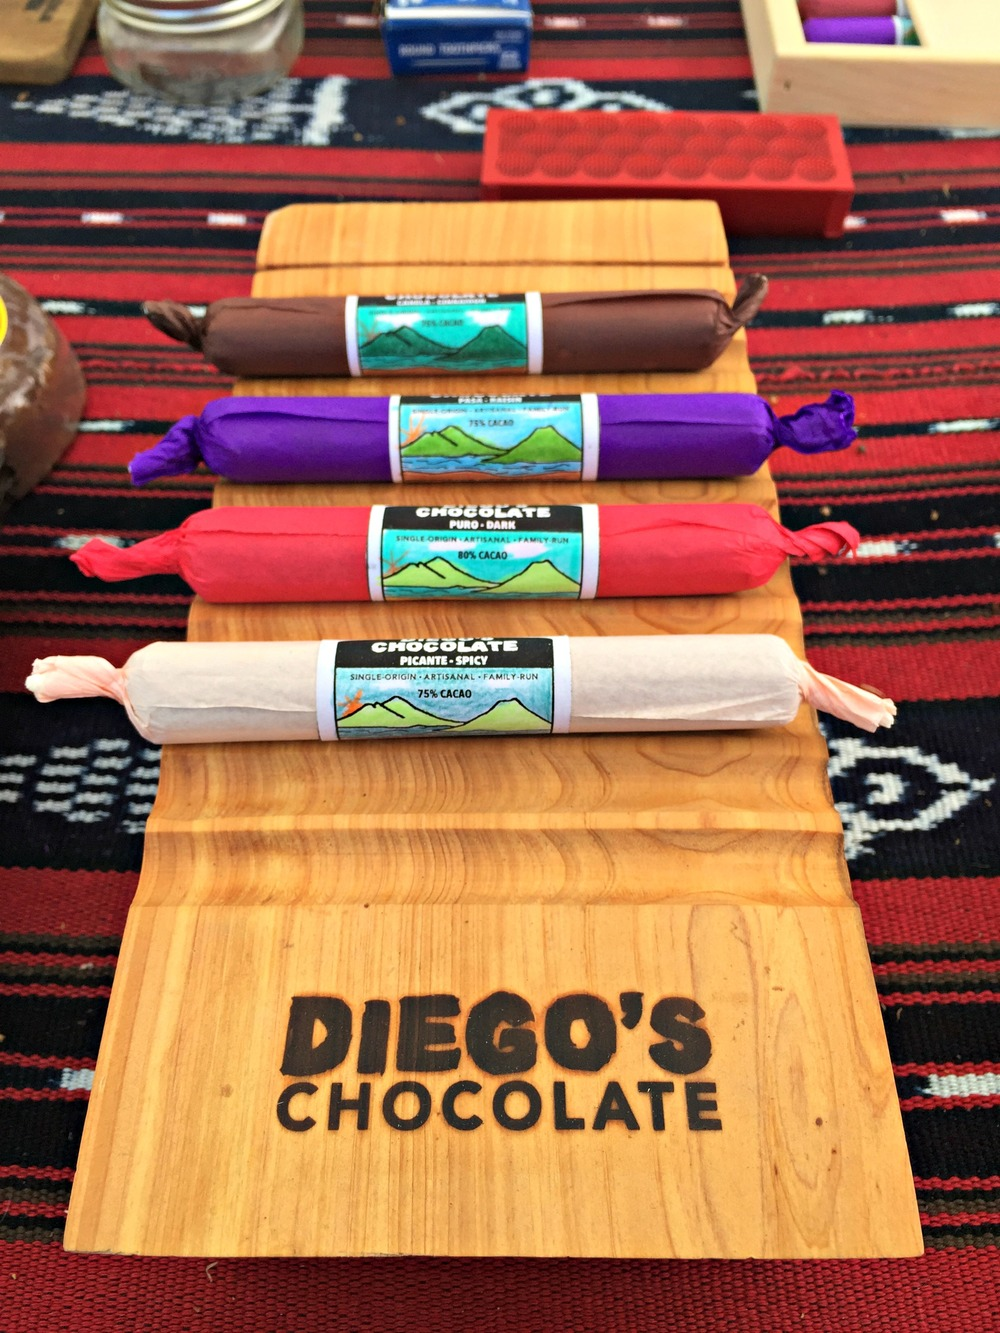 Diego's Chocolate